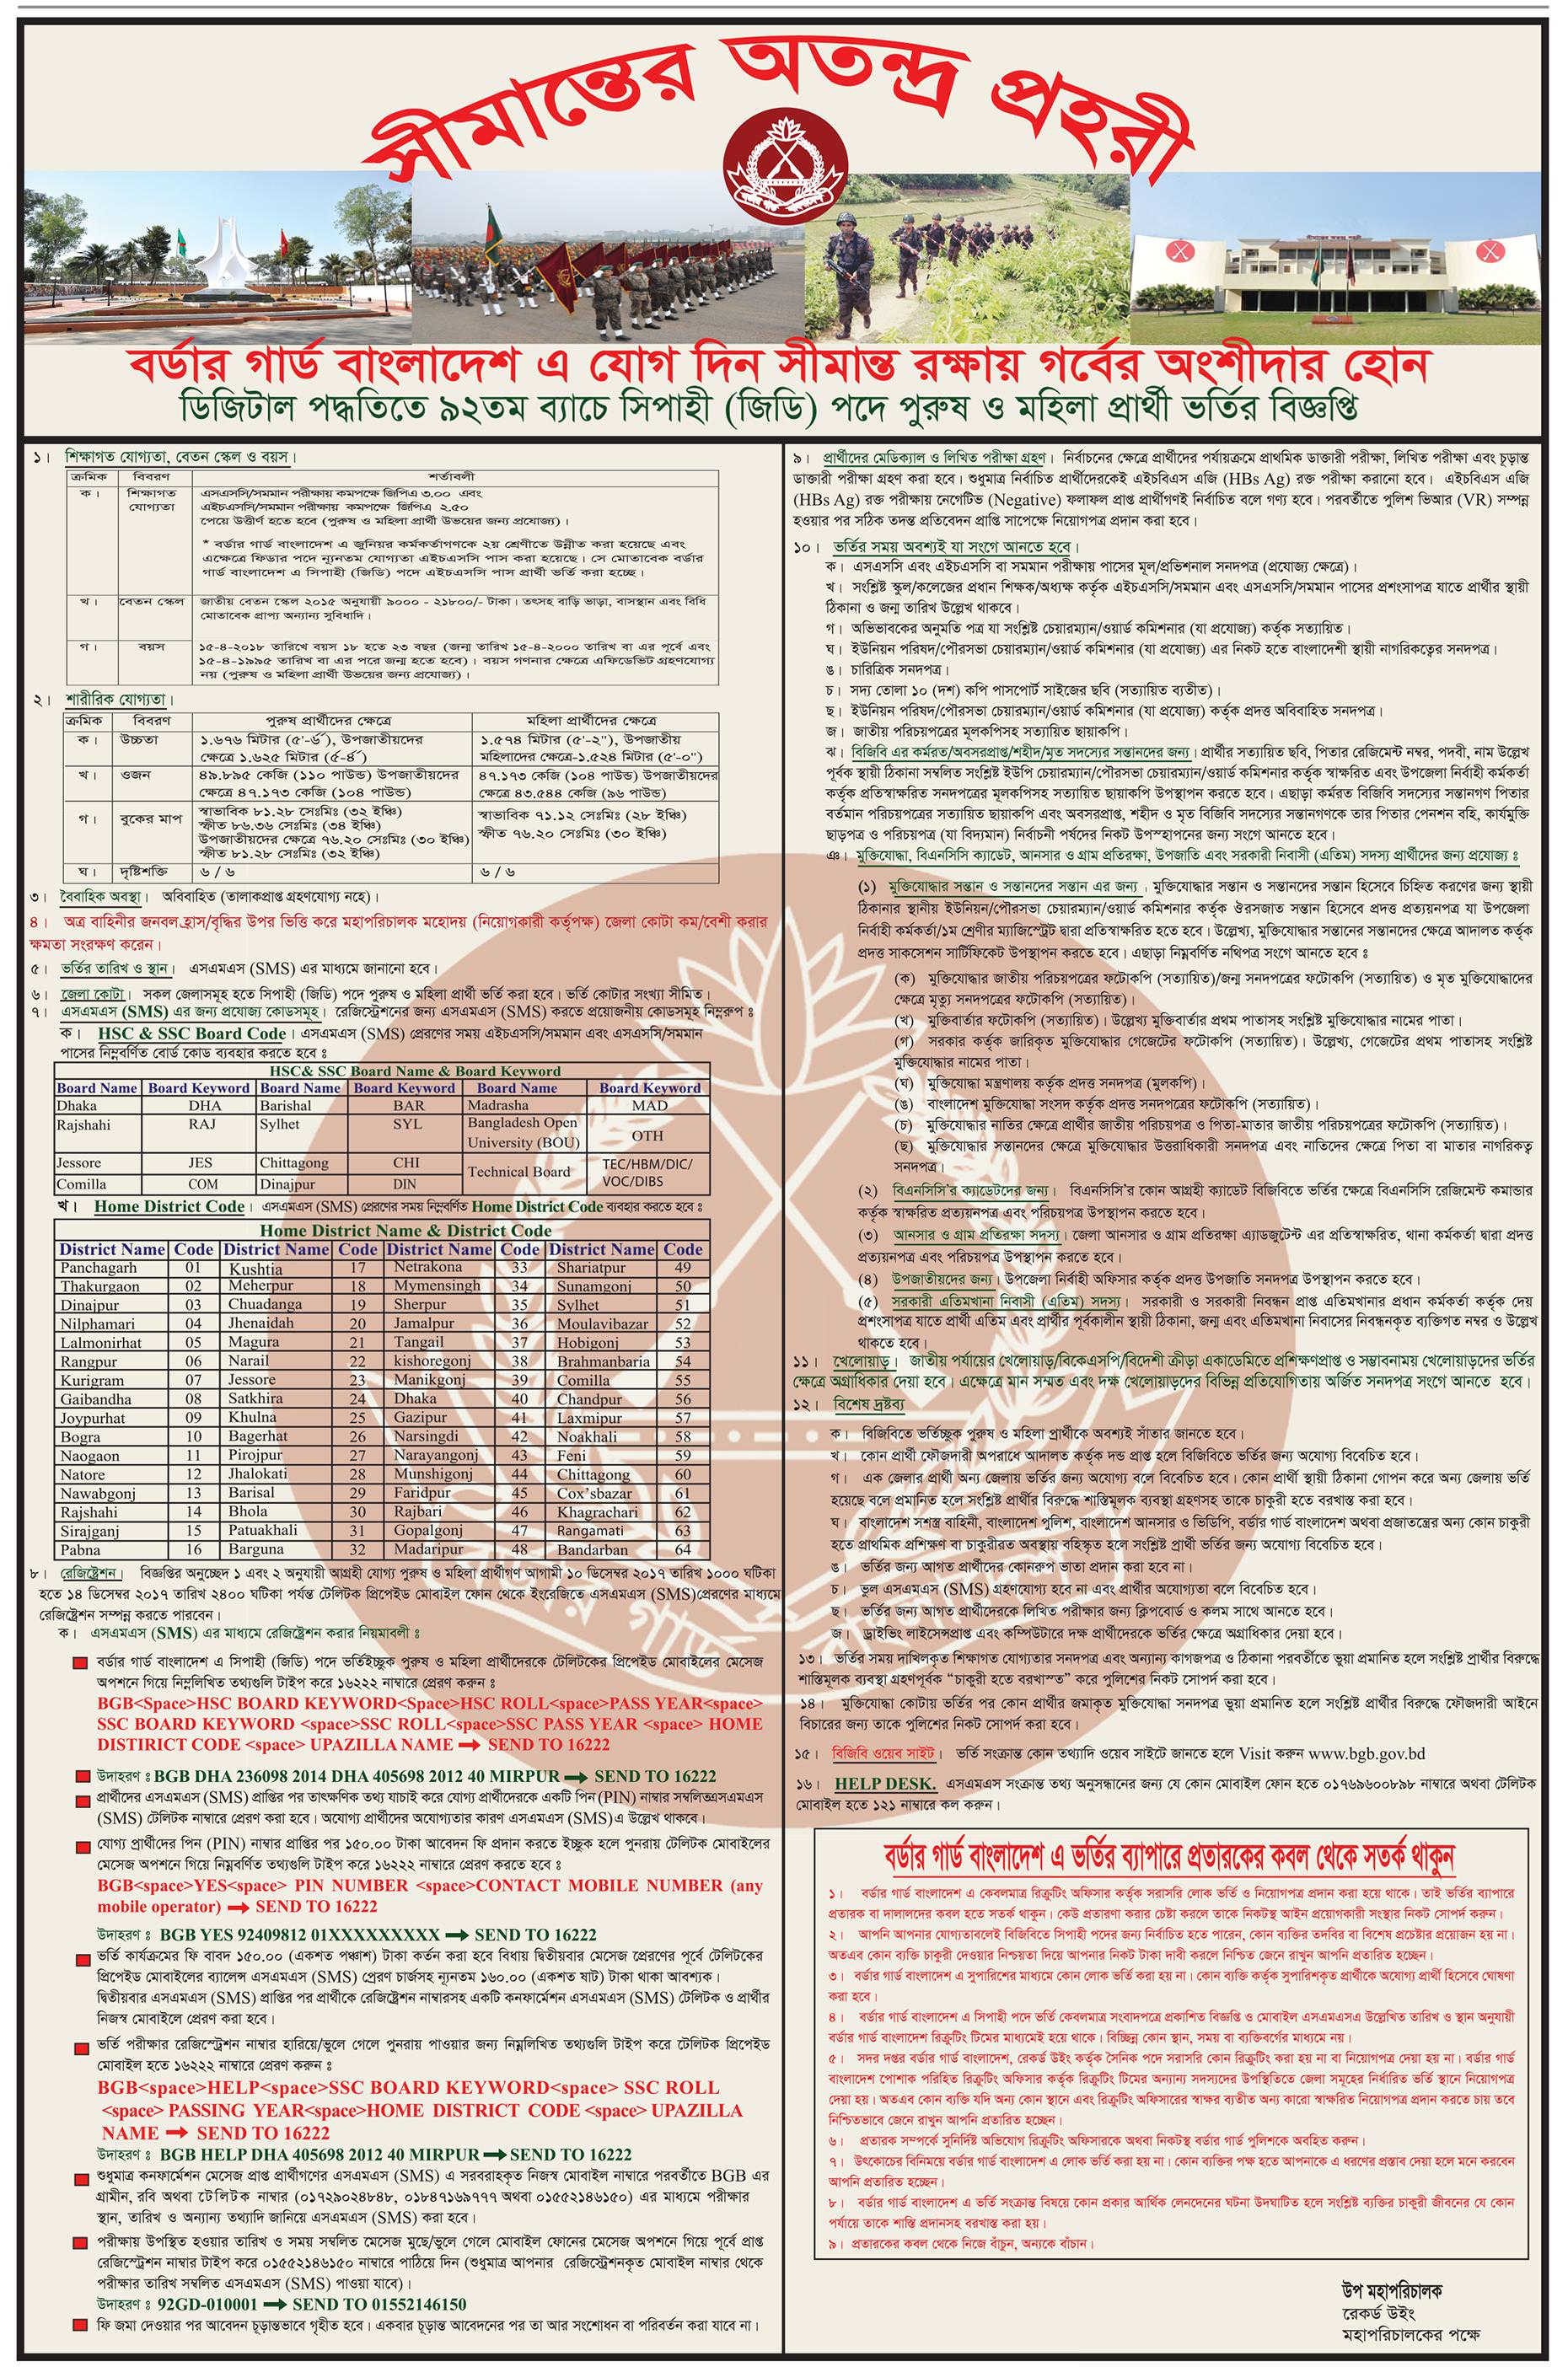 Border Guard Bangladesh Job Circular 2017